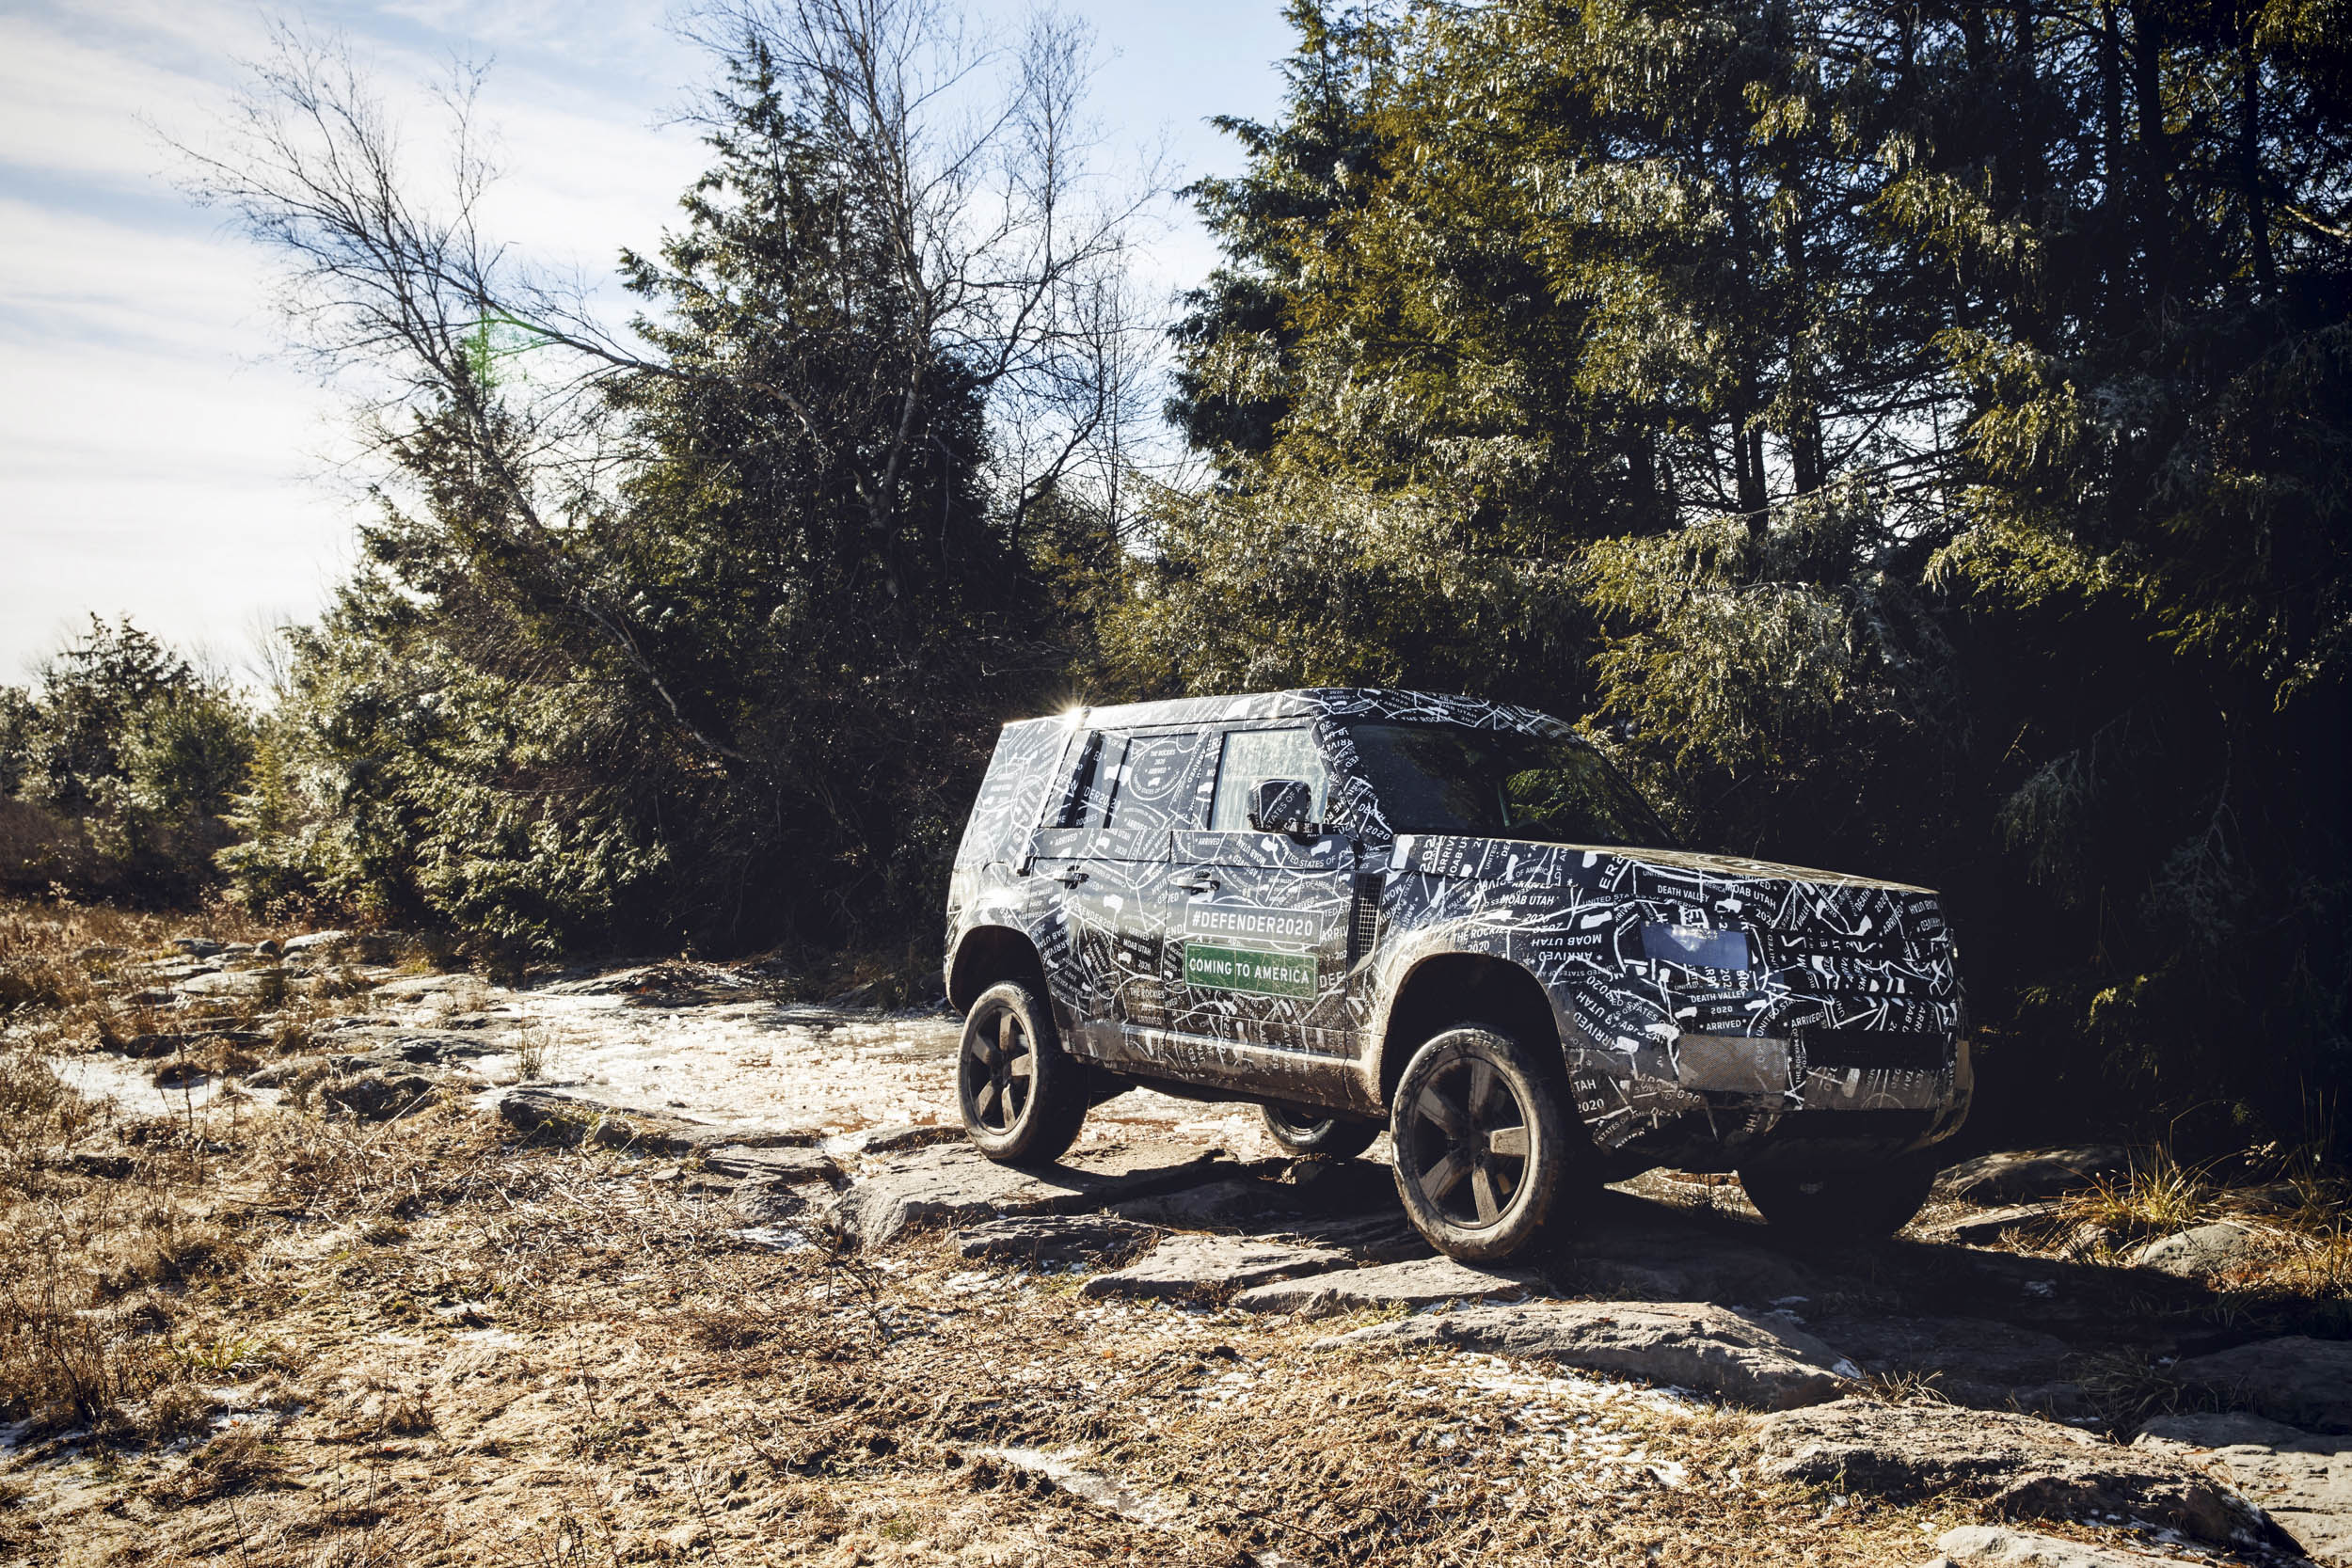 Land Rover Defender driving